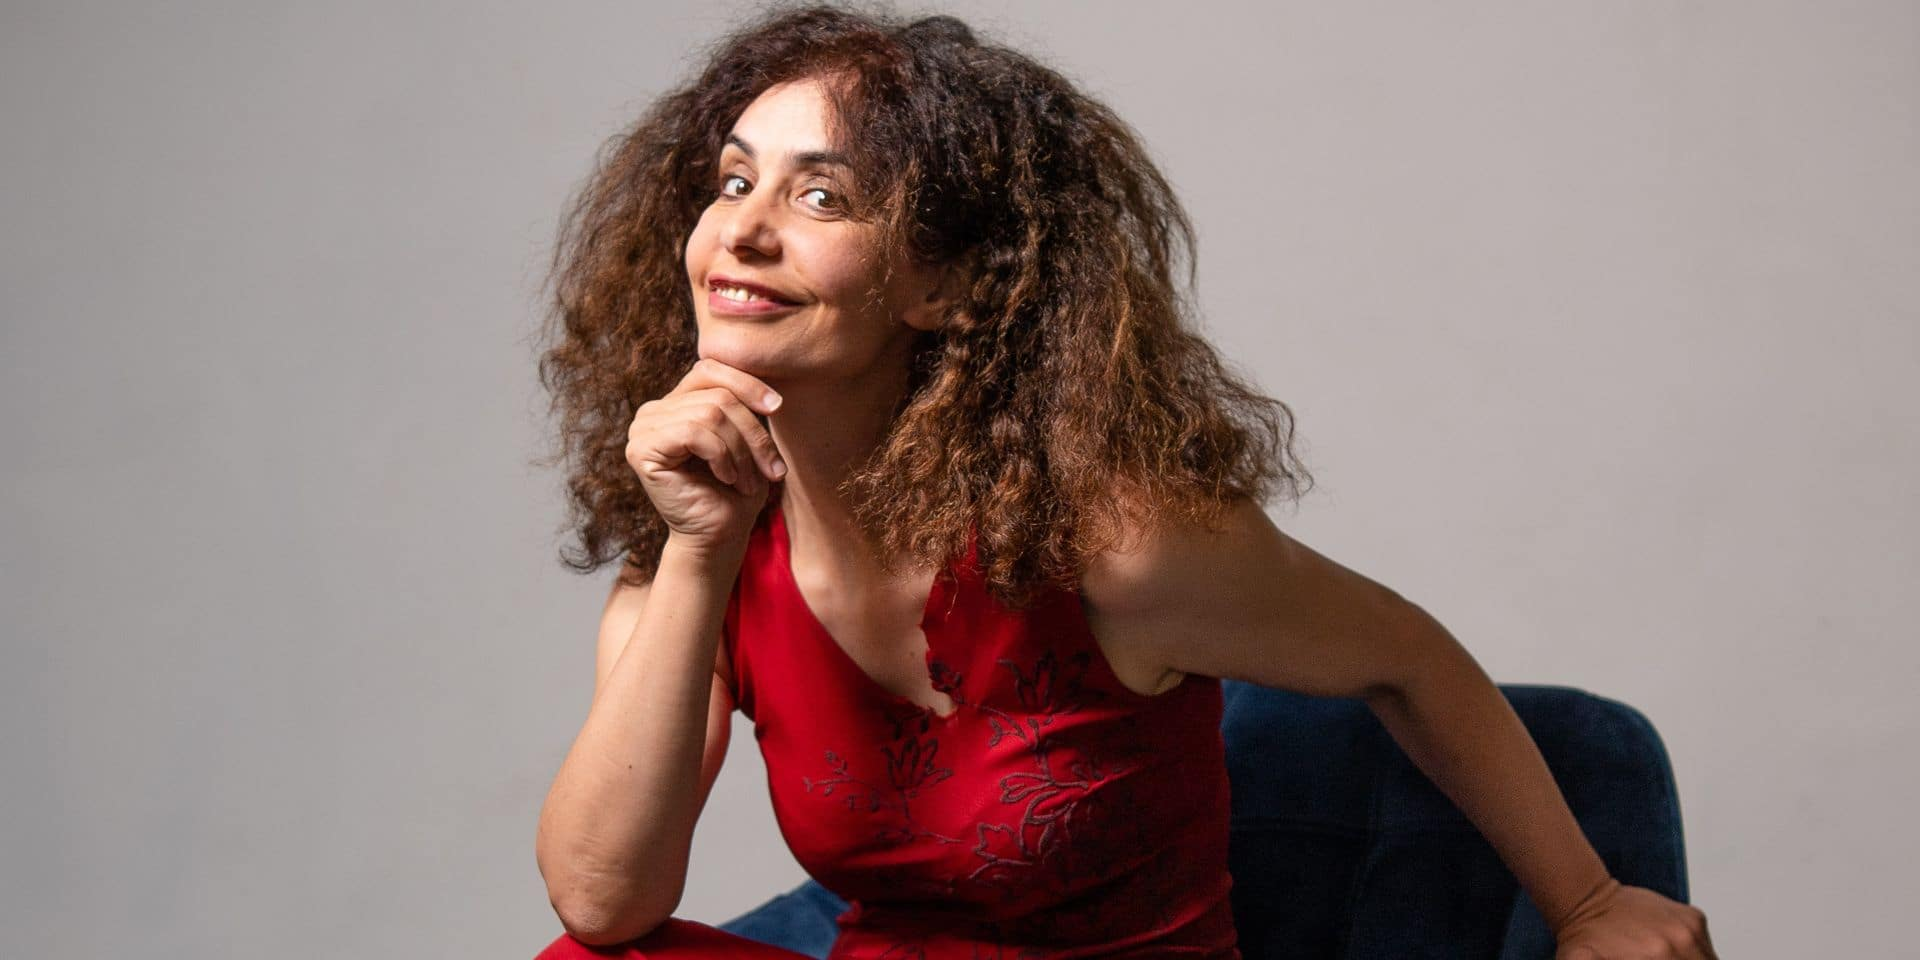 Bruxelles - Jette: Kadija Leclere, directrice de casting